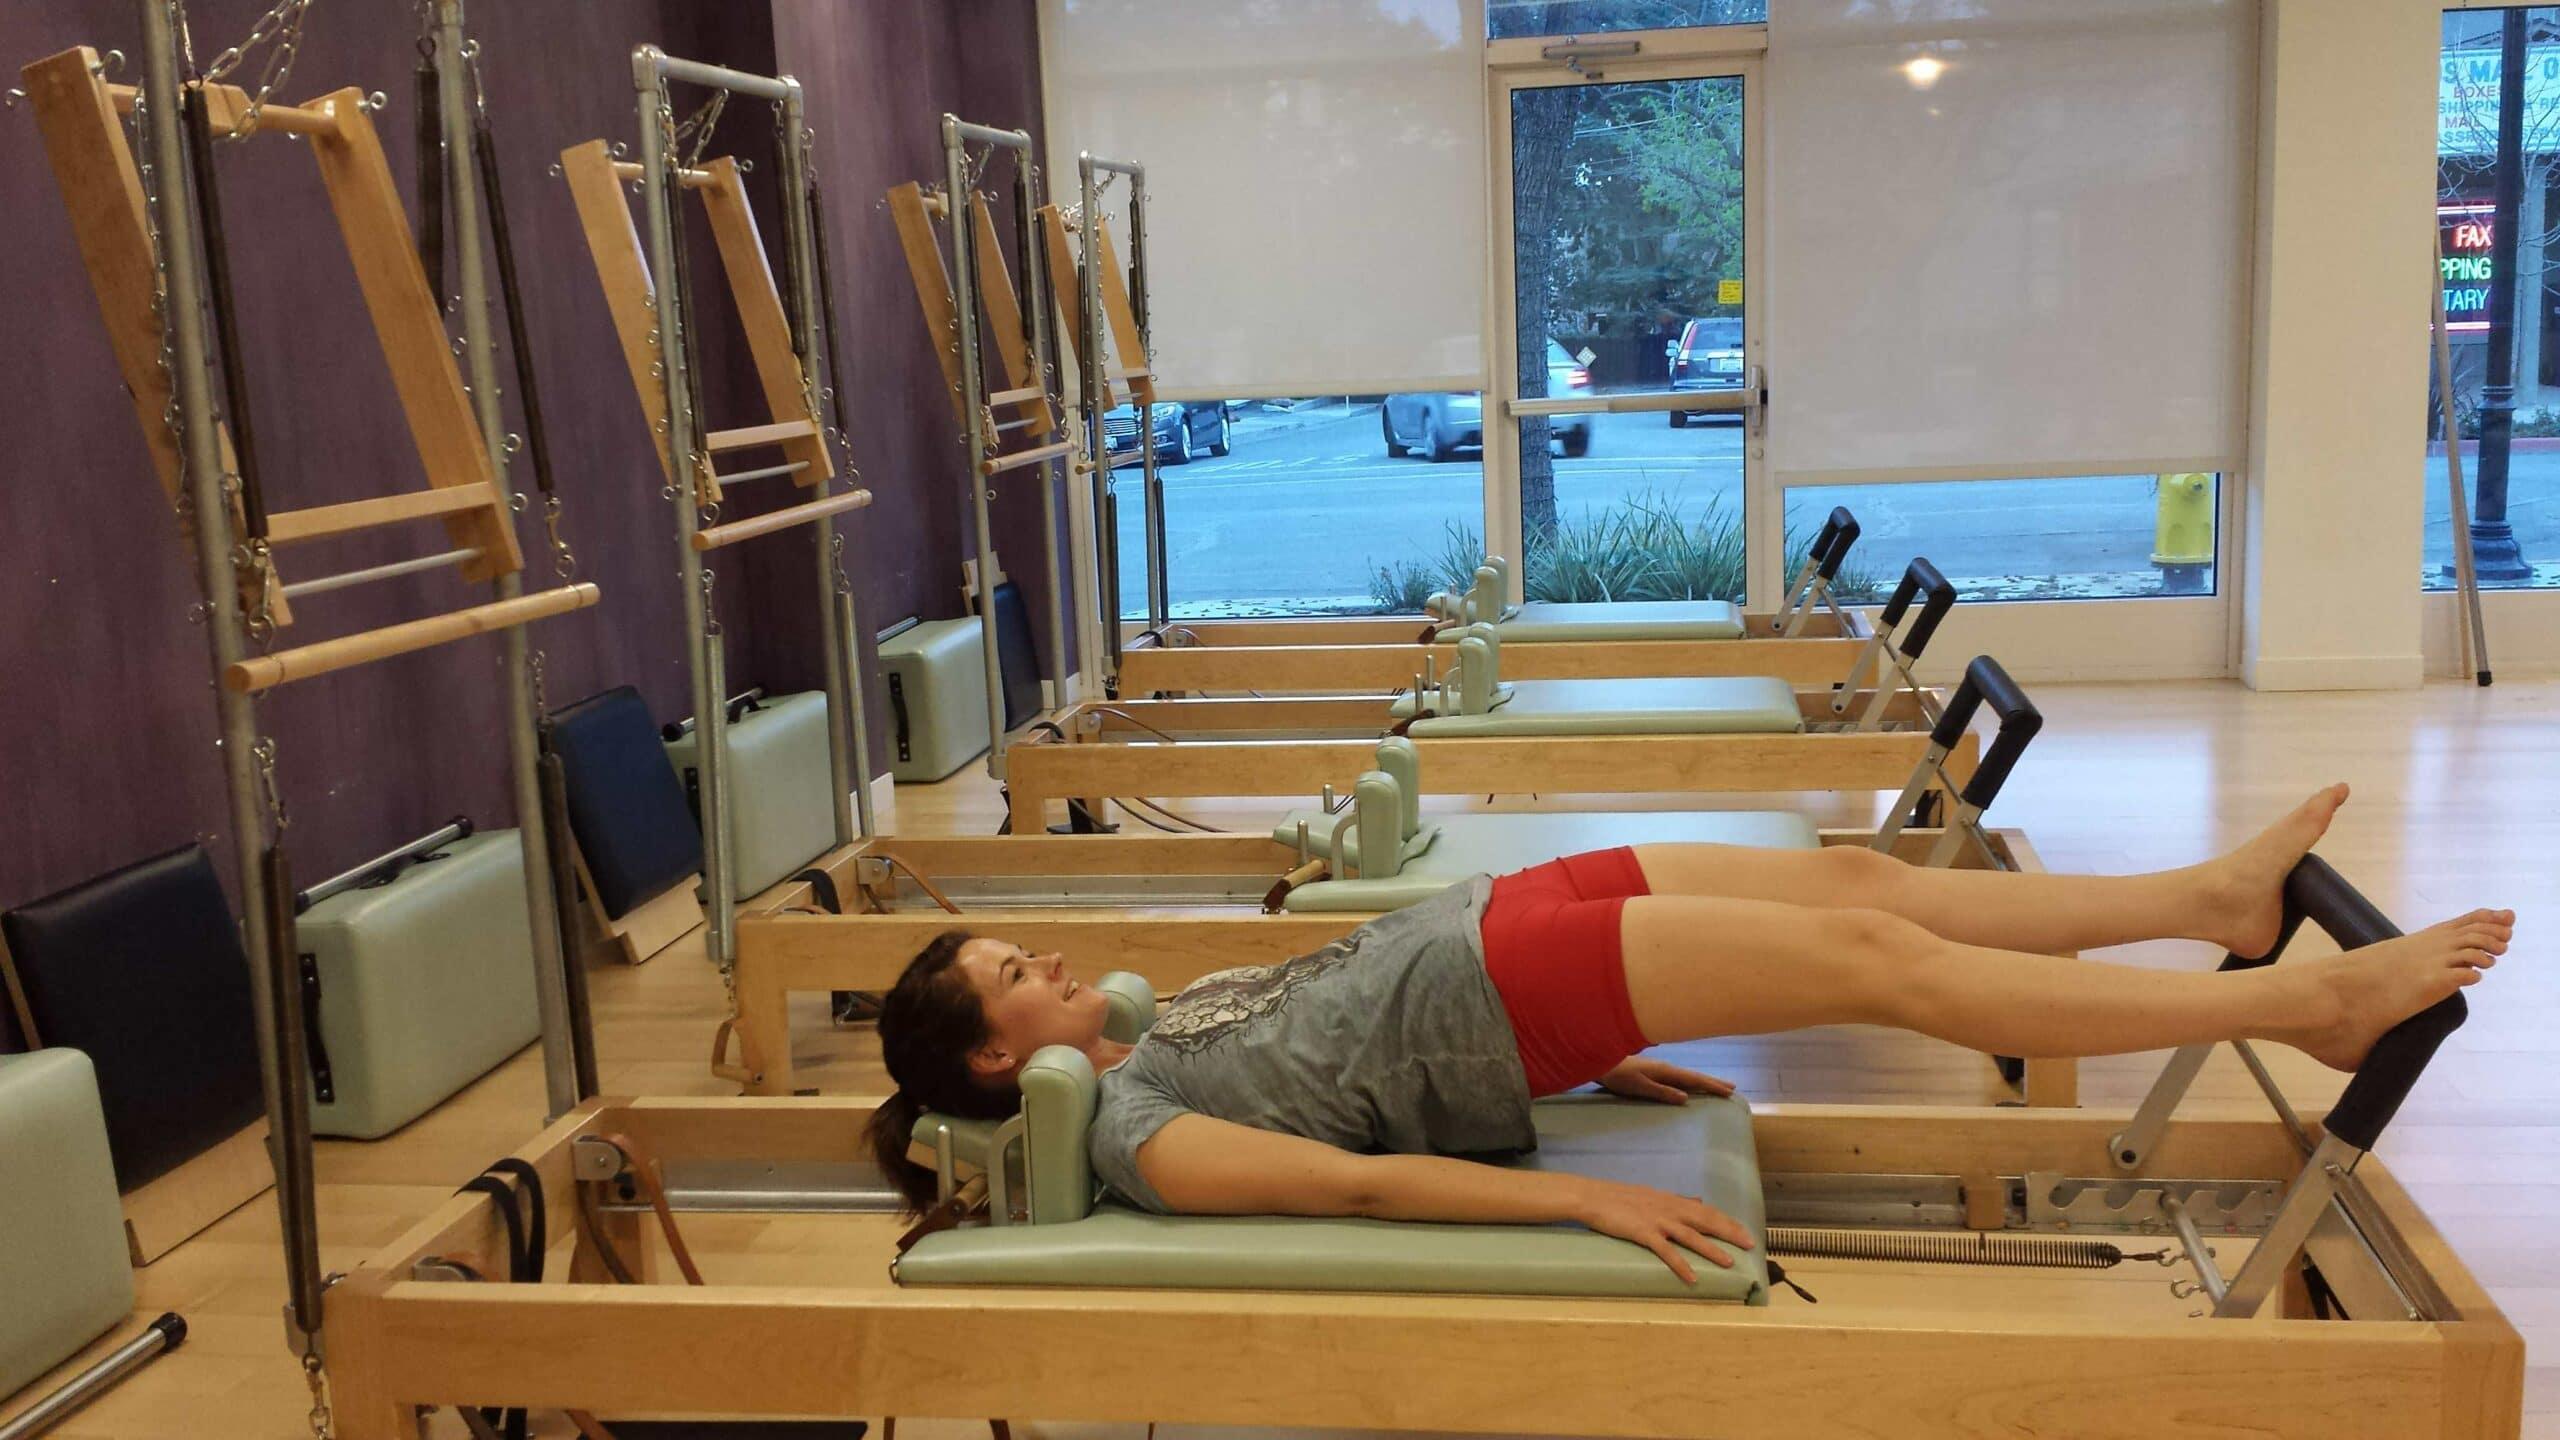 gwen_pilates_lebootcamp